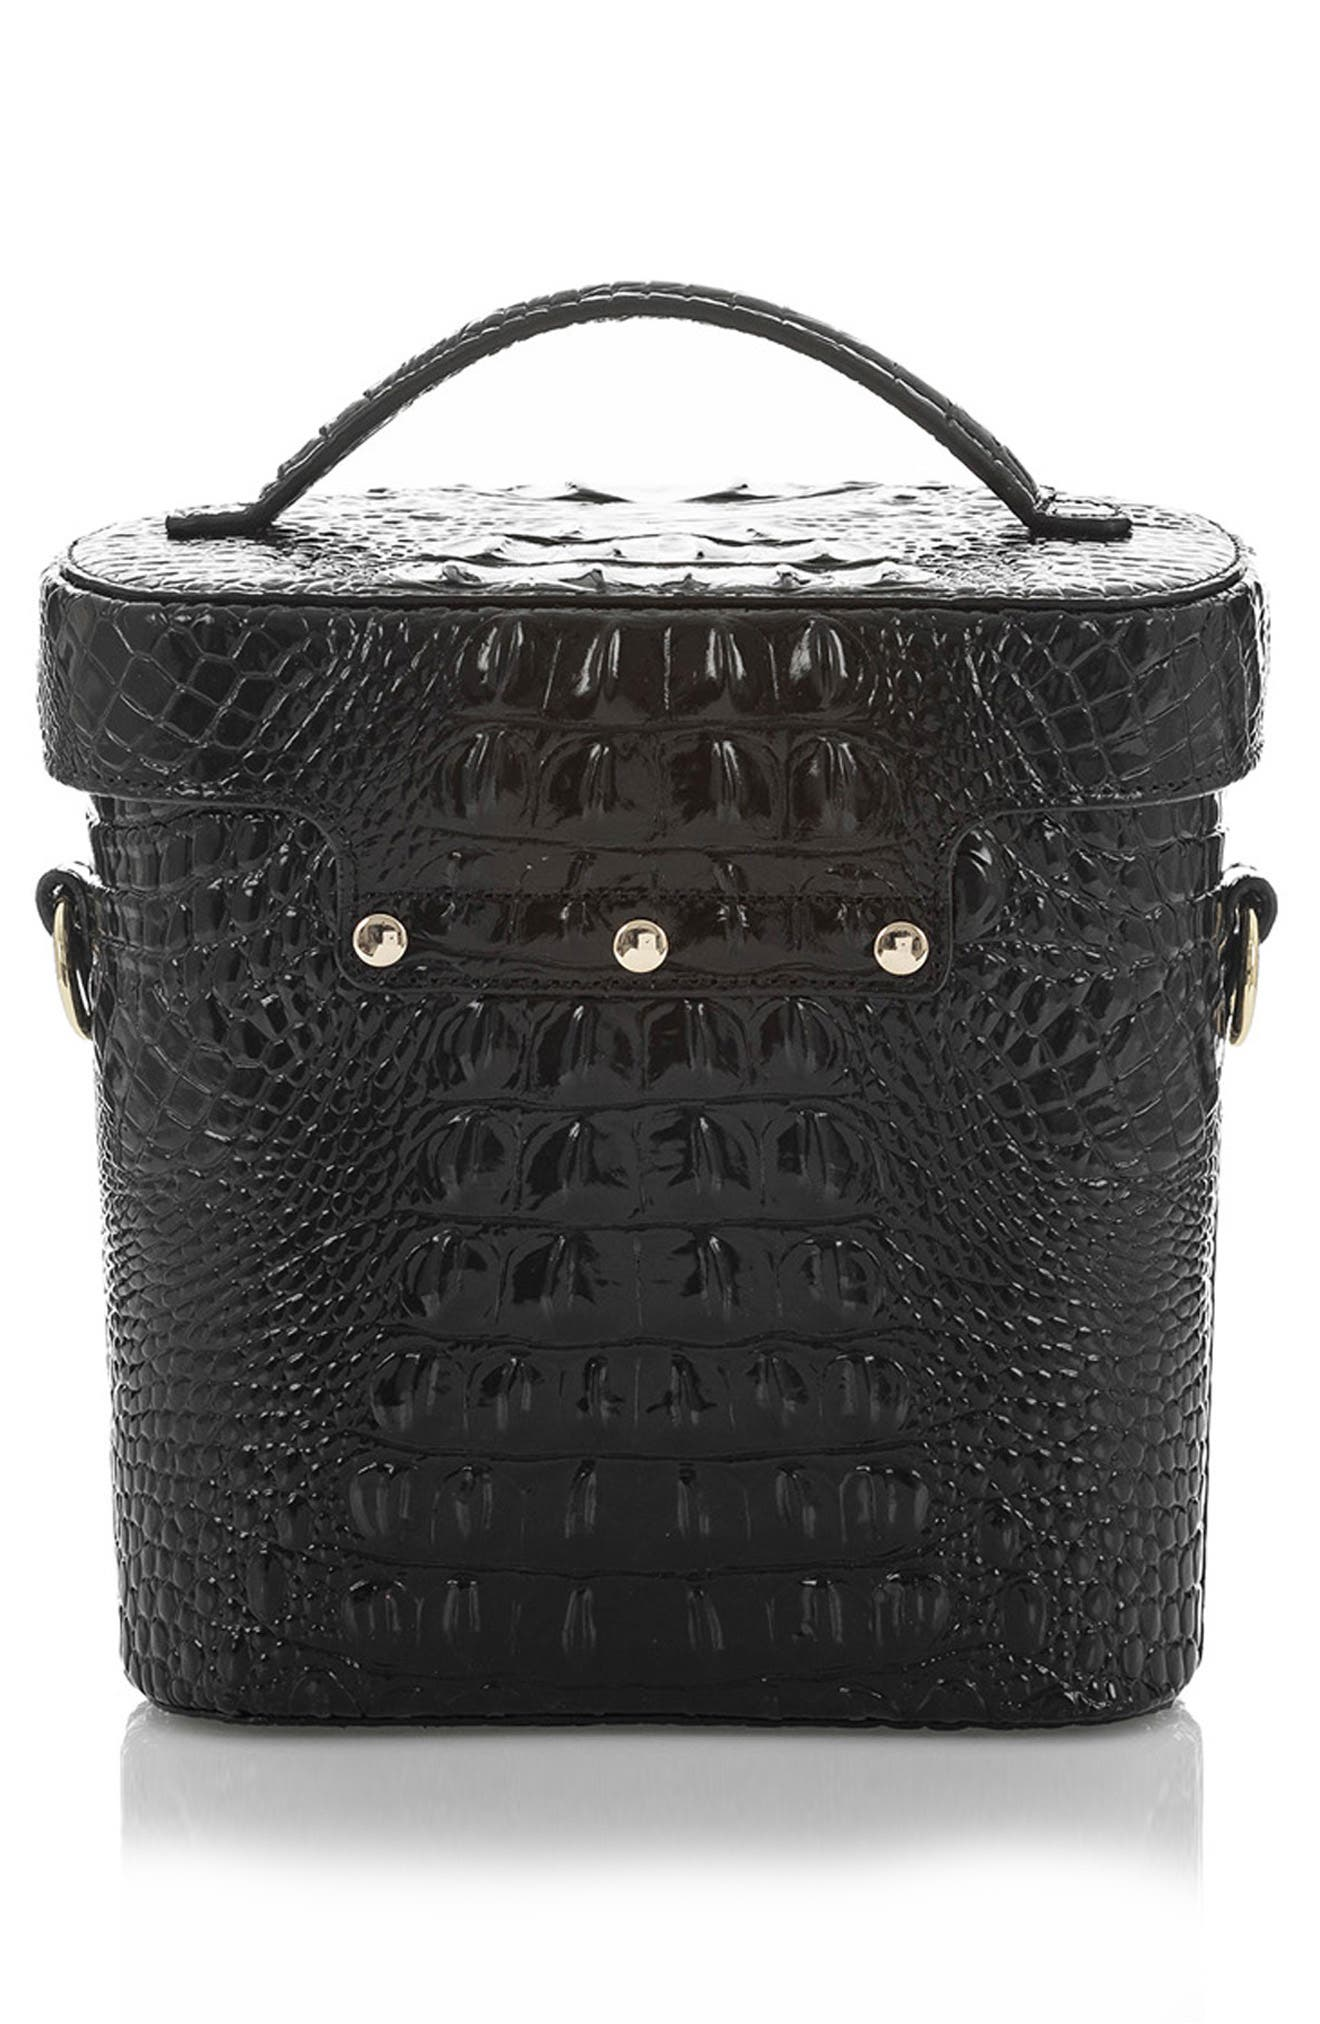 Pipp Croc Embossed Leather Top Handle Bag,                             Alternate thumbnail 2, color,                             BLACK MEMBOURNE